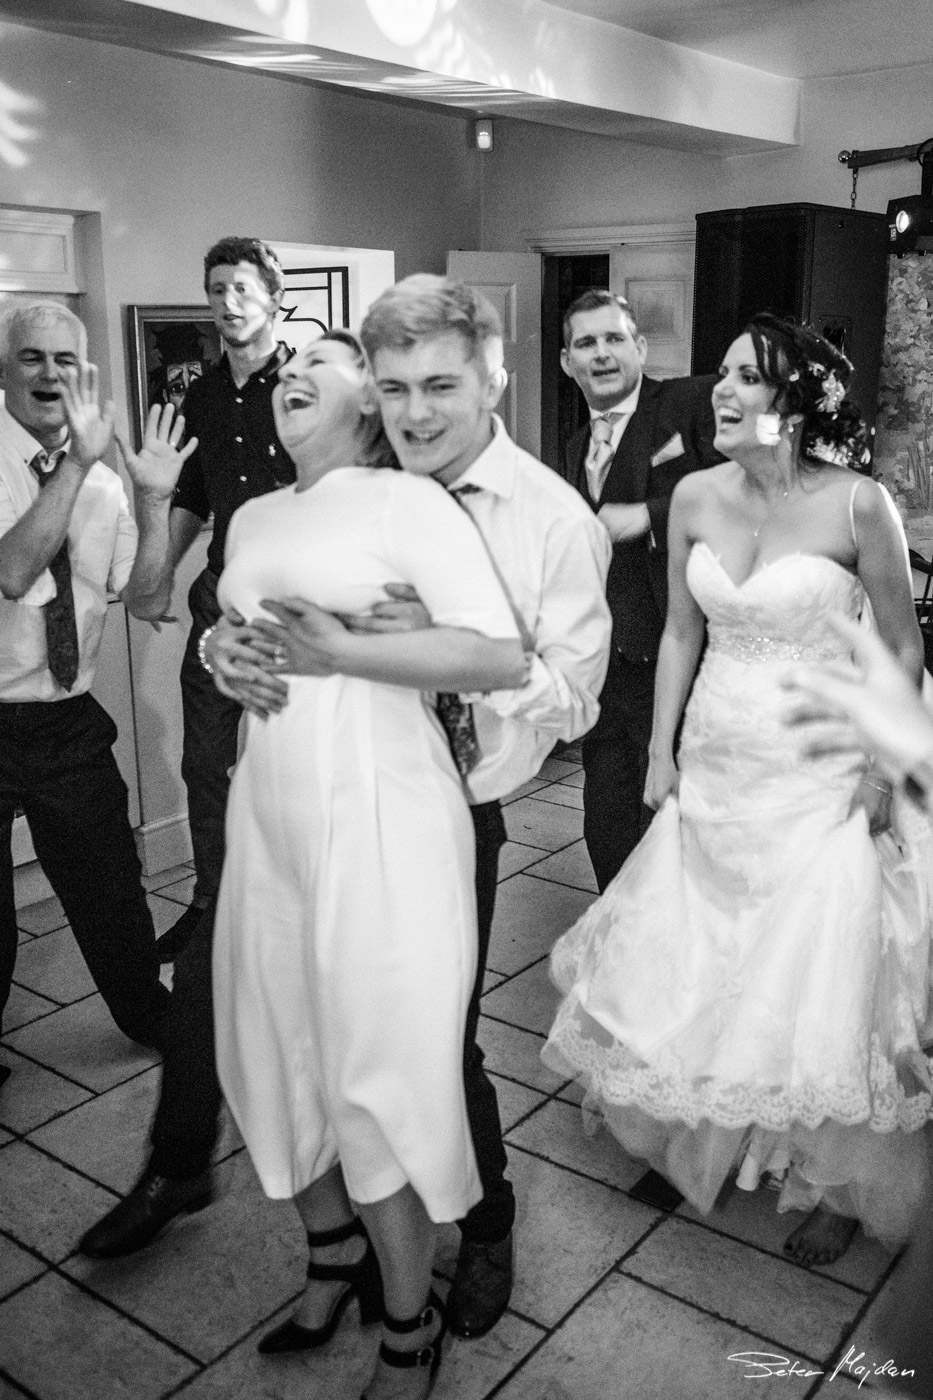 east-bridgford-hill-wedding-photography-73.jpg